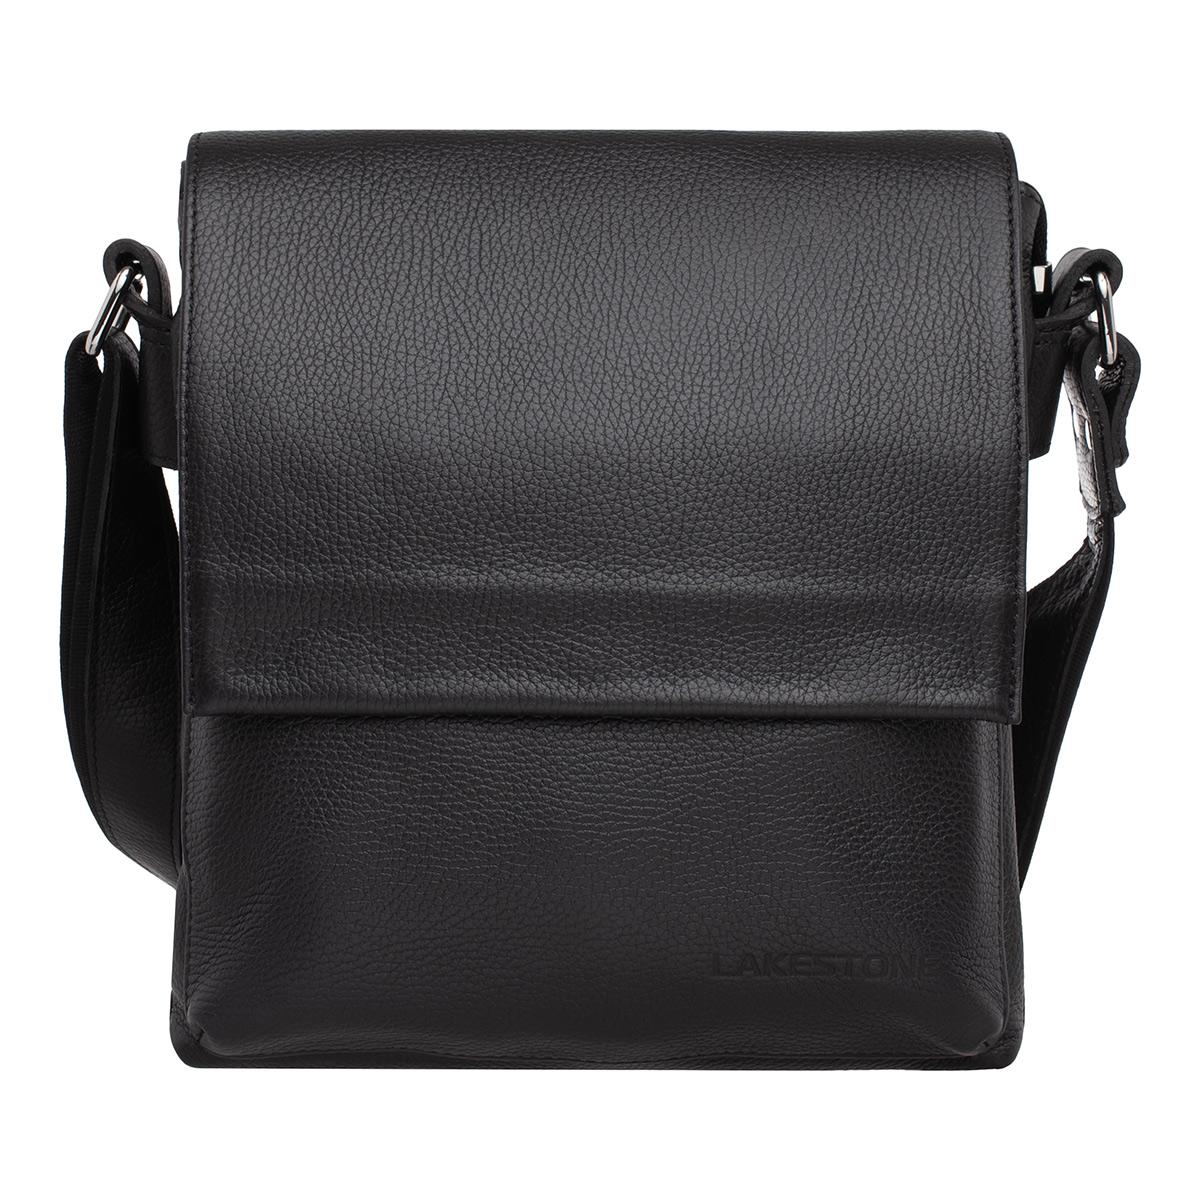 Мужская сумка через плечо Shellmor Black